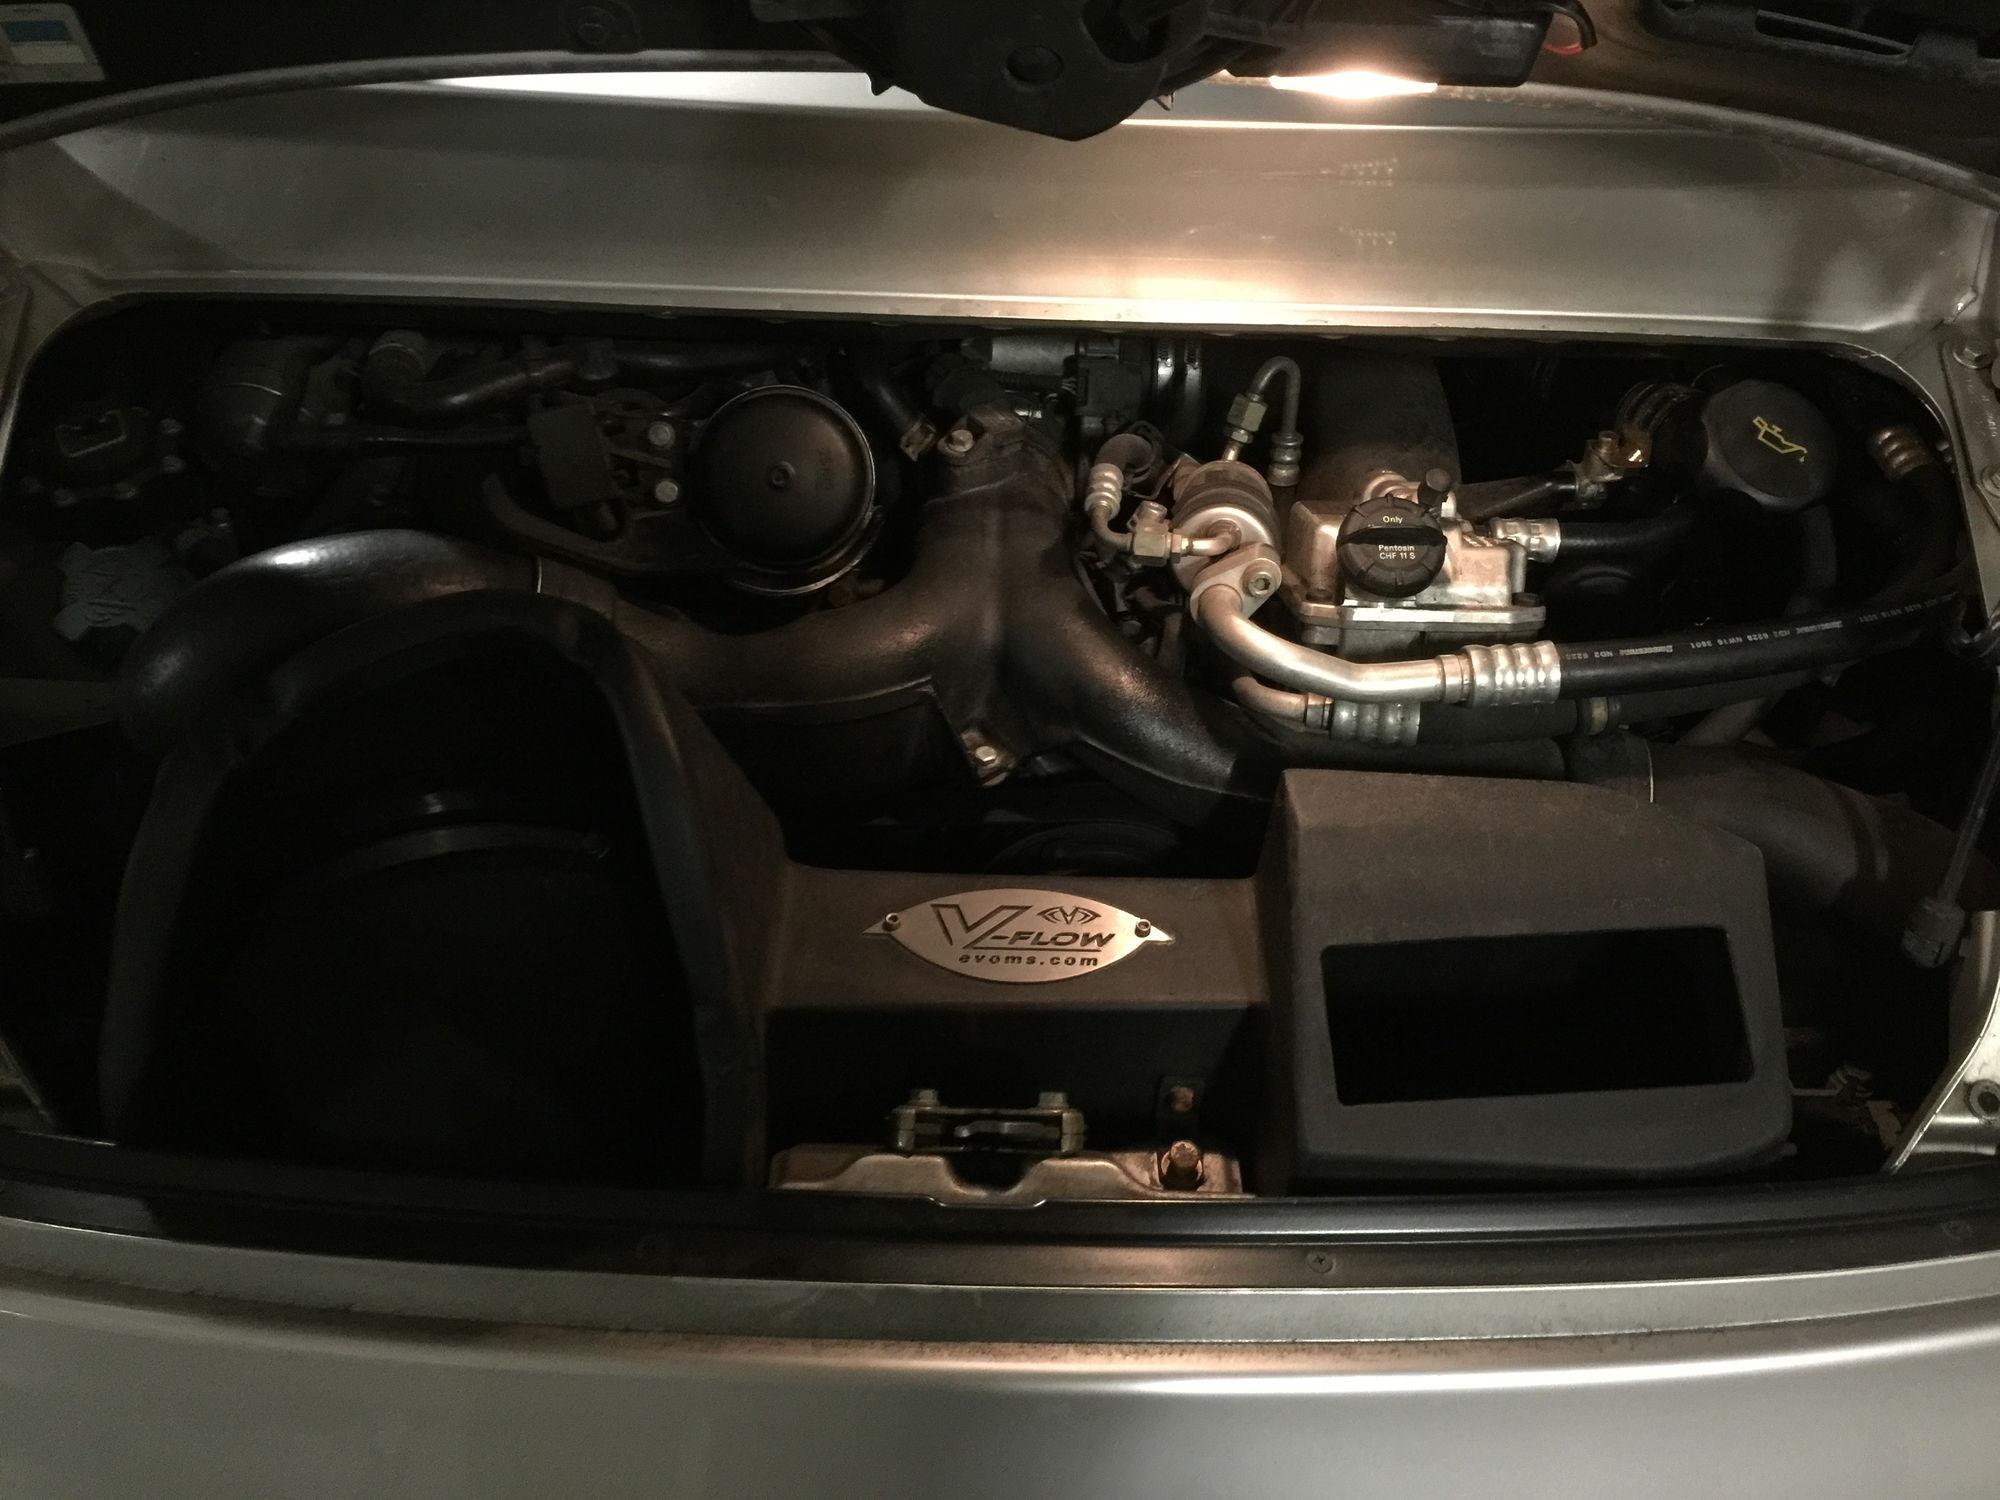 80-09_engine_02_4255d89cee78a151ce0b03a5ed3edfee69598bce Terrific 2002 Porsche 911 Carrera Turbo Gt2 X50 Cars Trend